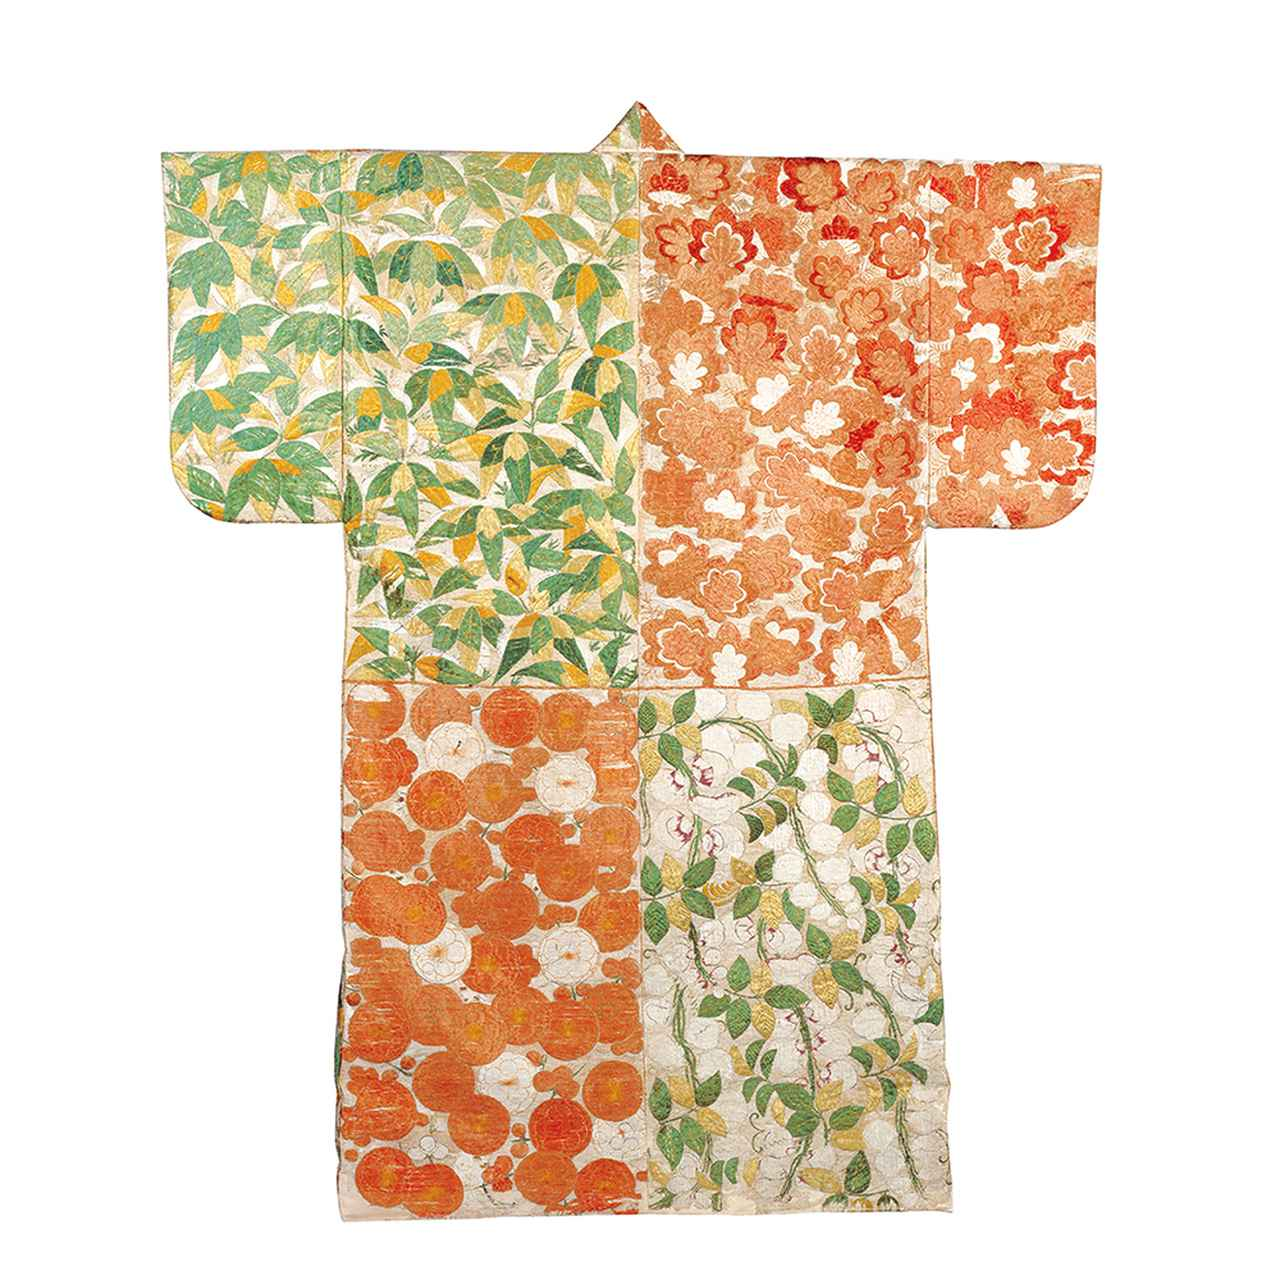 Images : 『きもの KIMONO』|東京国立博物館